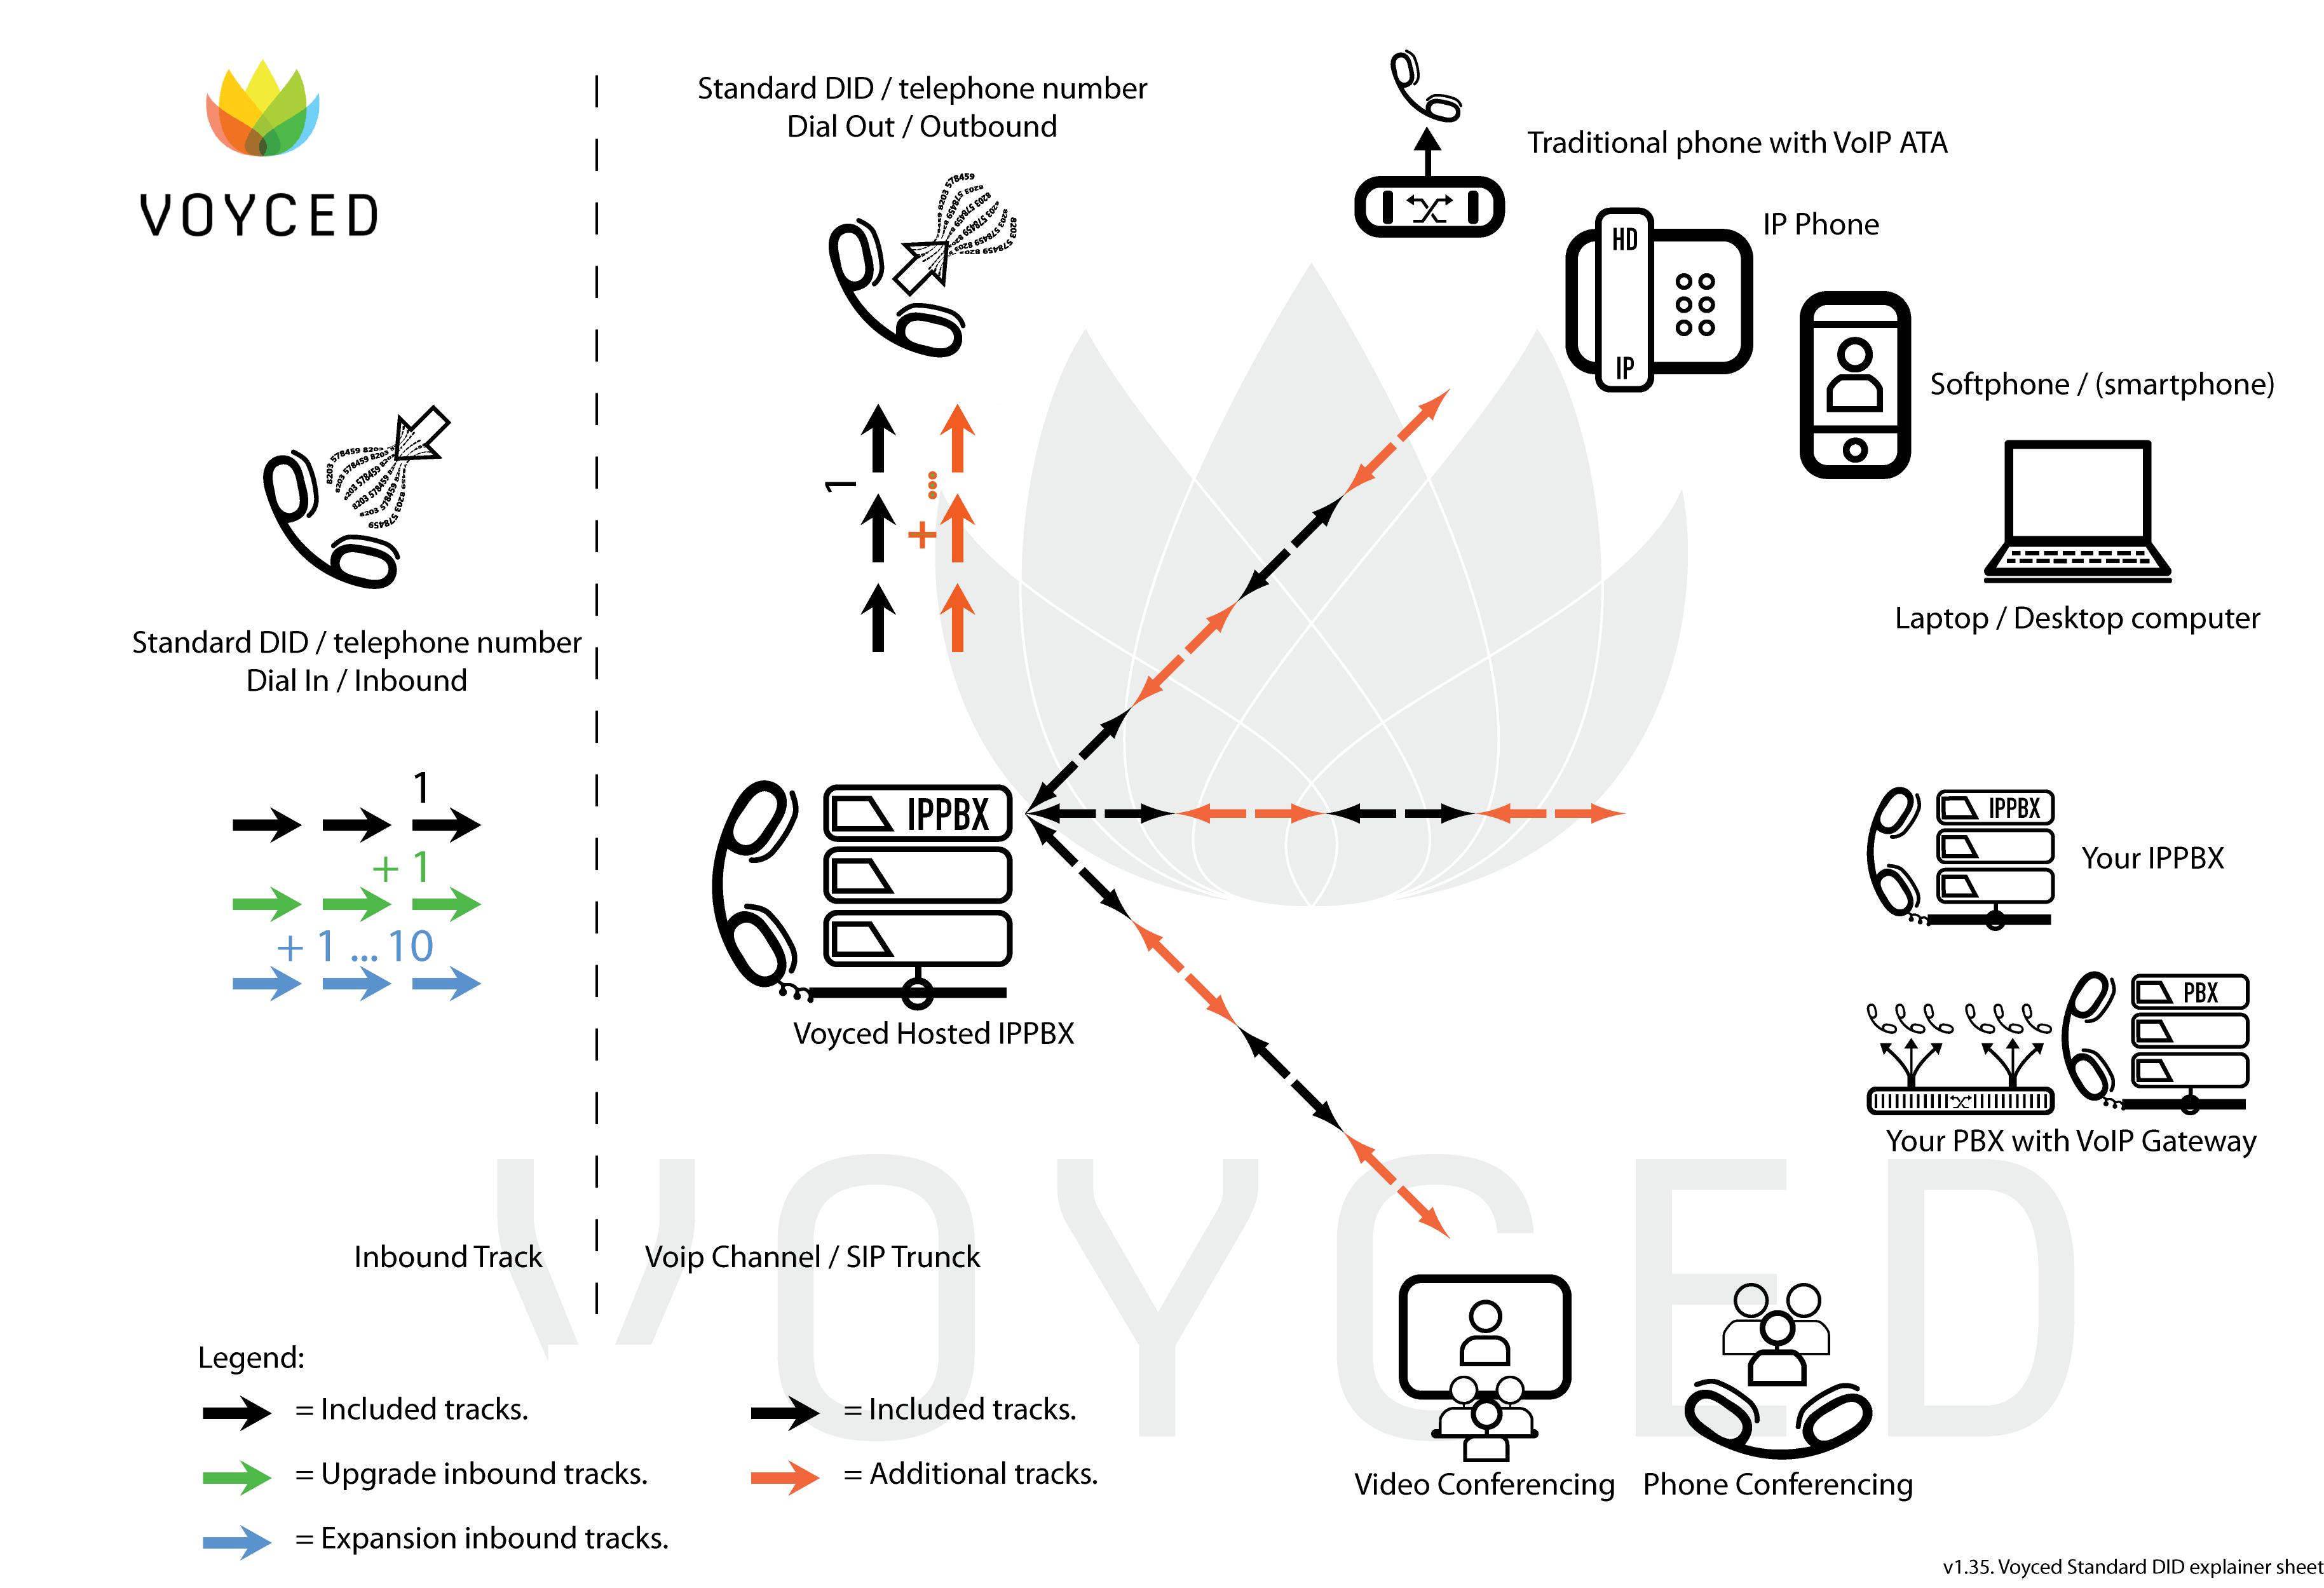 Voyced Standard DID explainer sheet